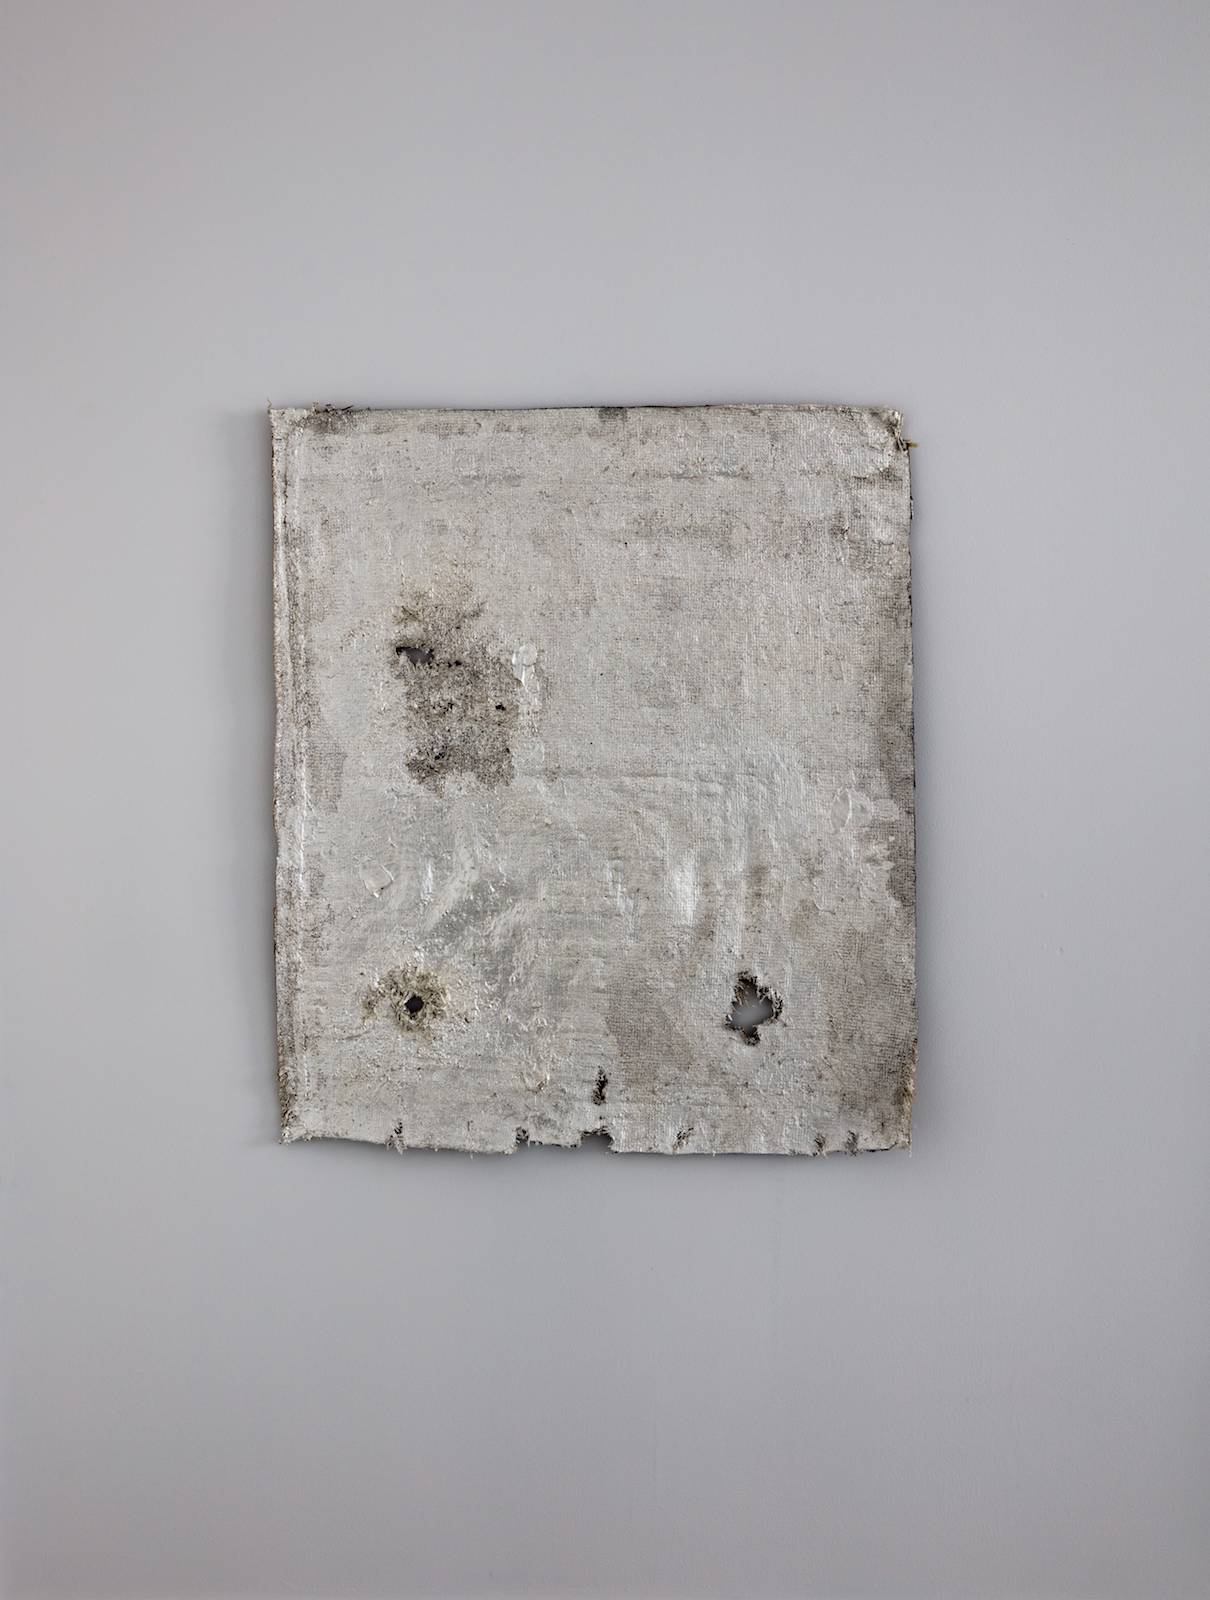 Claude Ballin (Council of Hieria), 2017, baluch rug, ruler, silverleaf, lacquer, 86 x 74 cm